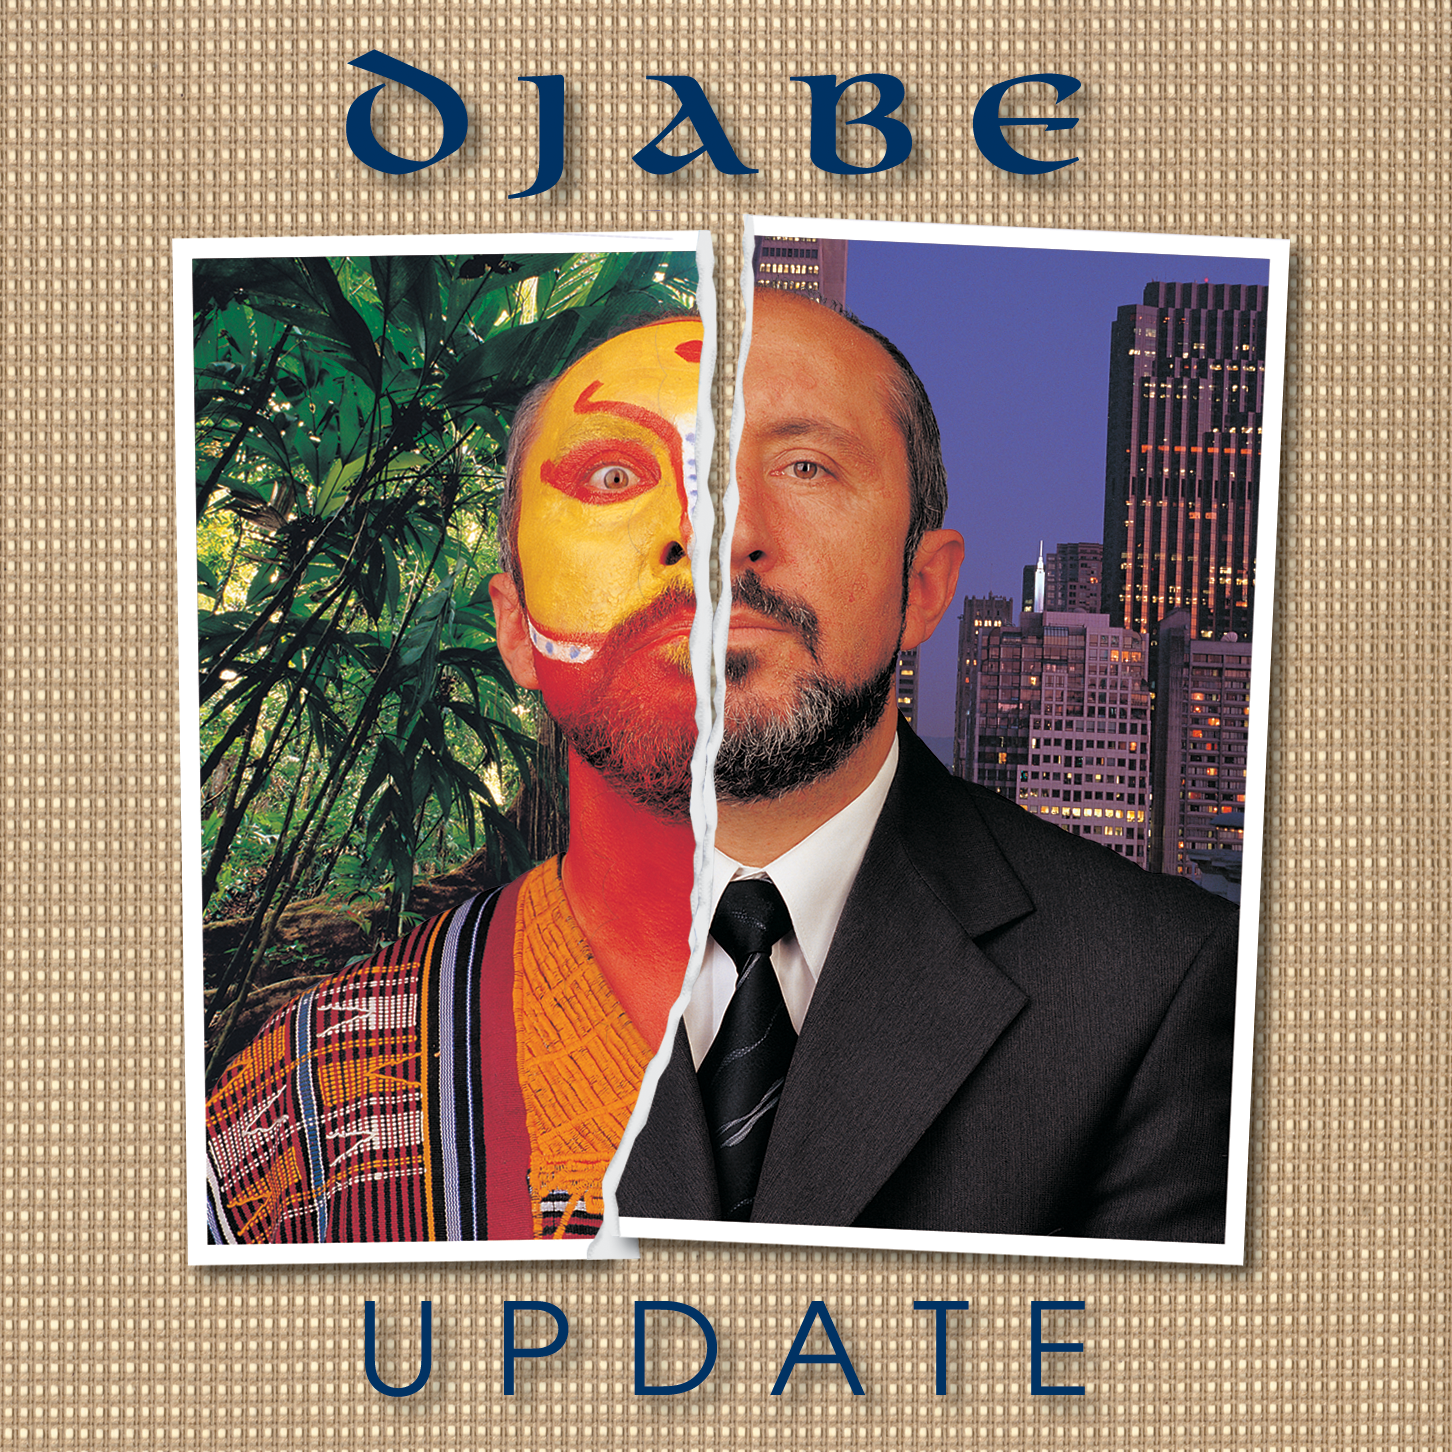 Djabe: Update CD